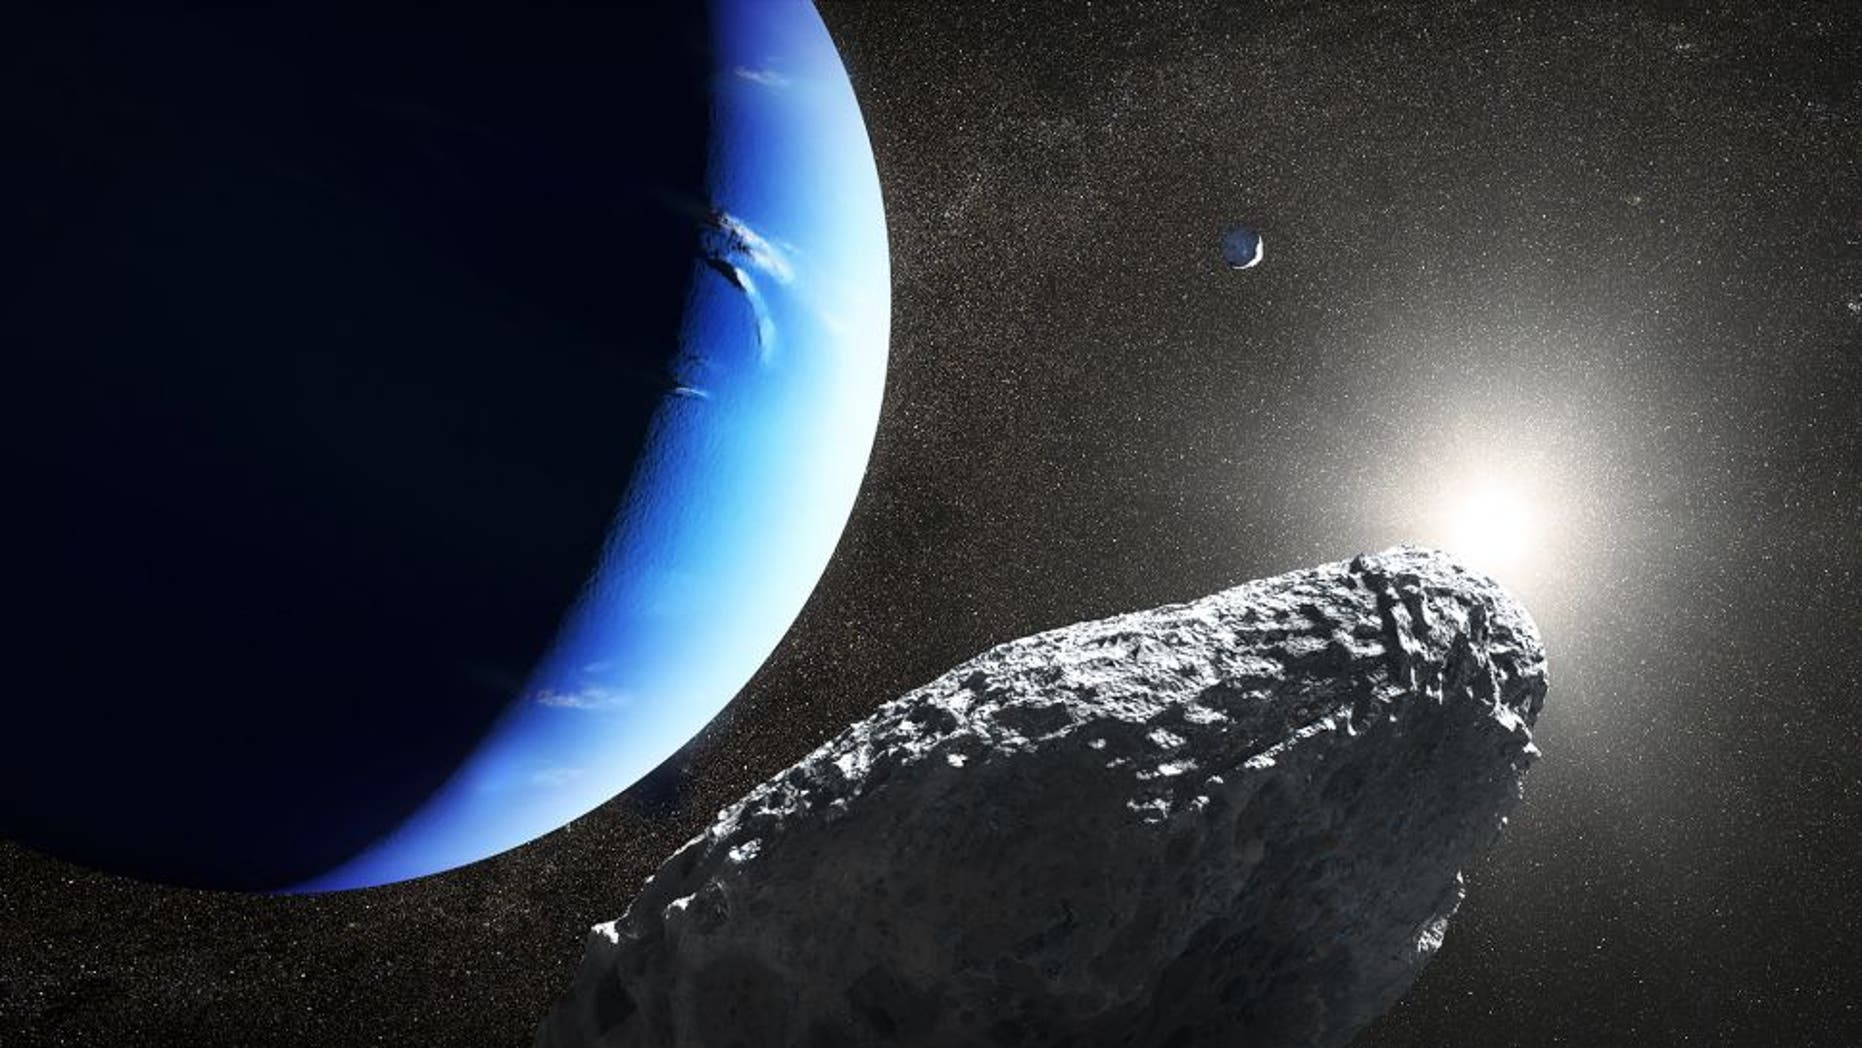 An artist's illustration of Netpune's smallest moon Hippocamp in orbit around the gas giant. It's just 20 miles across.